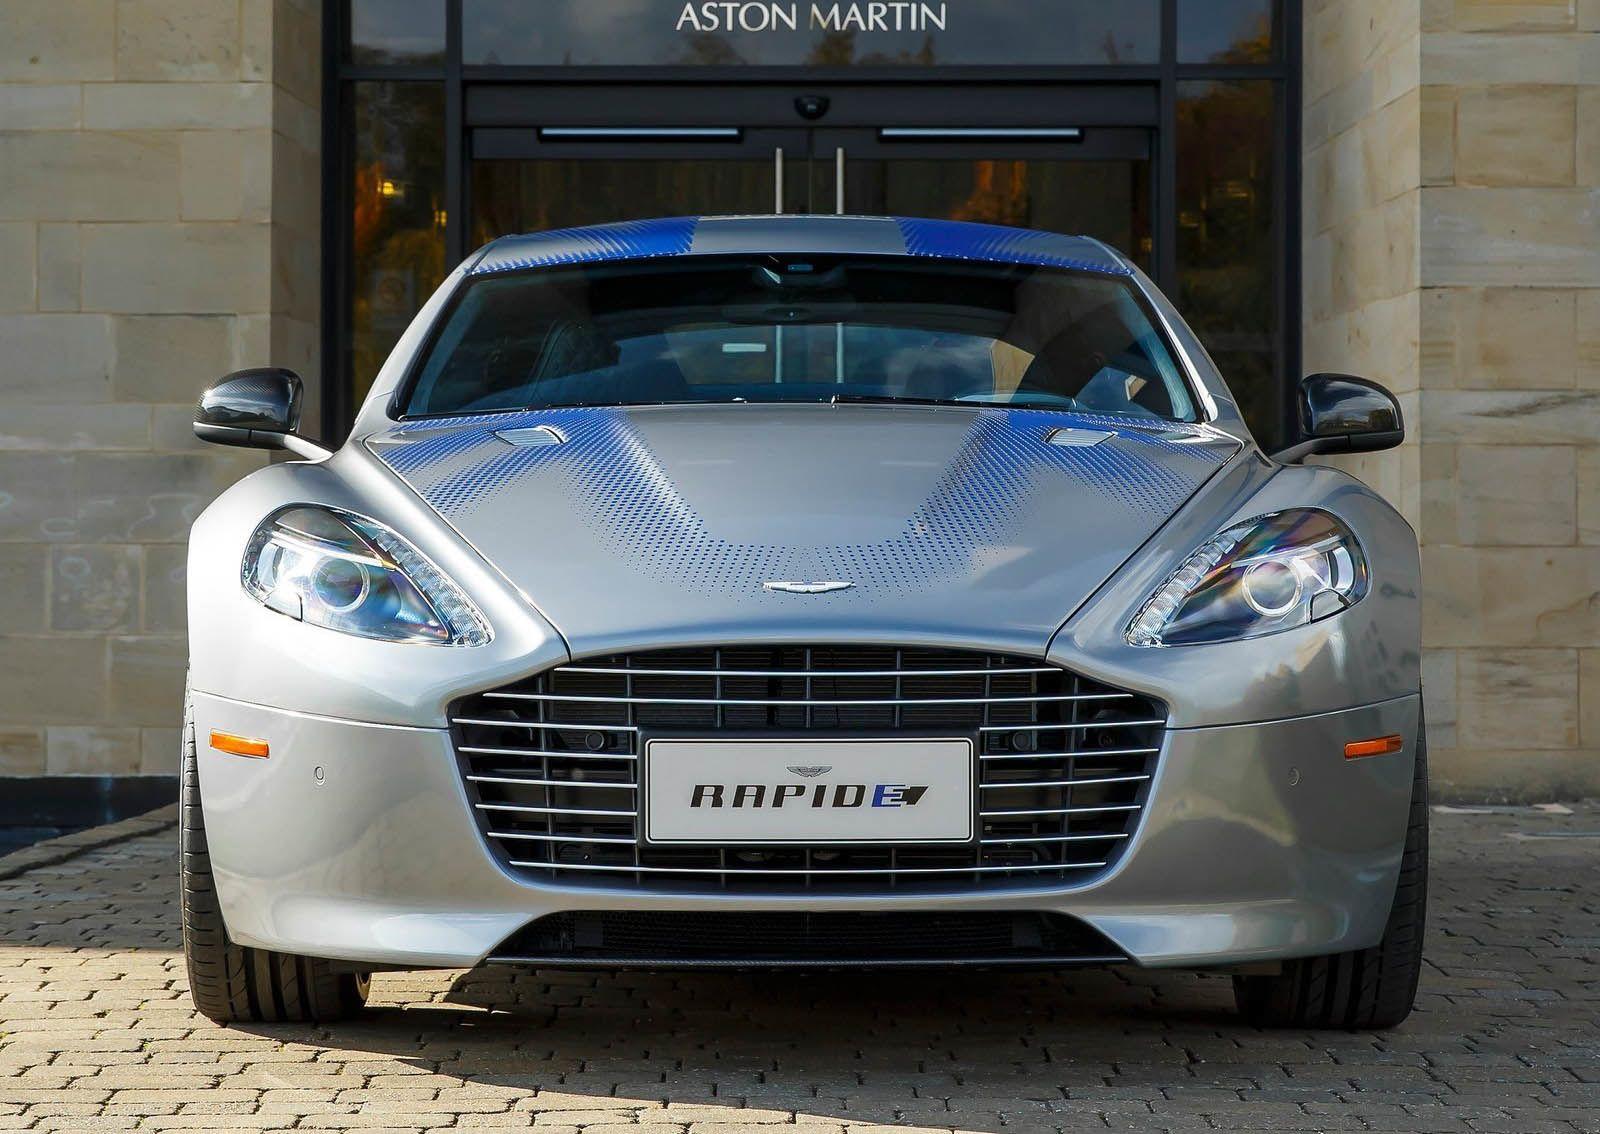 Aston Martin Rapid E_2